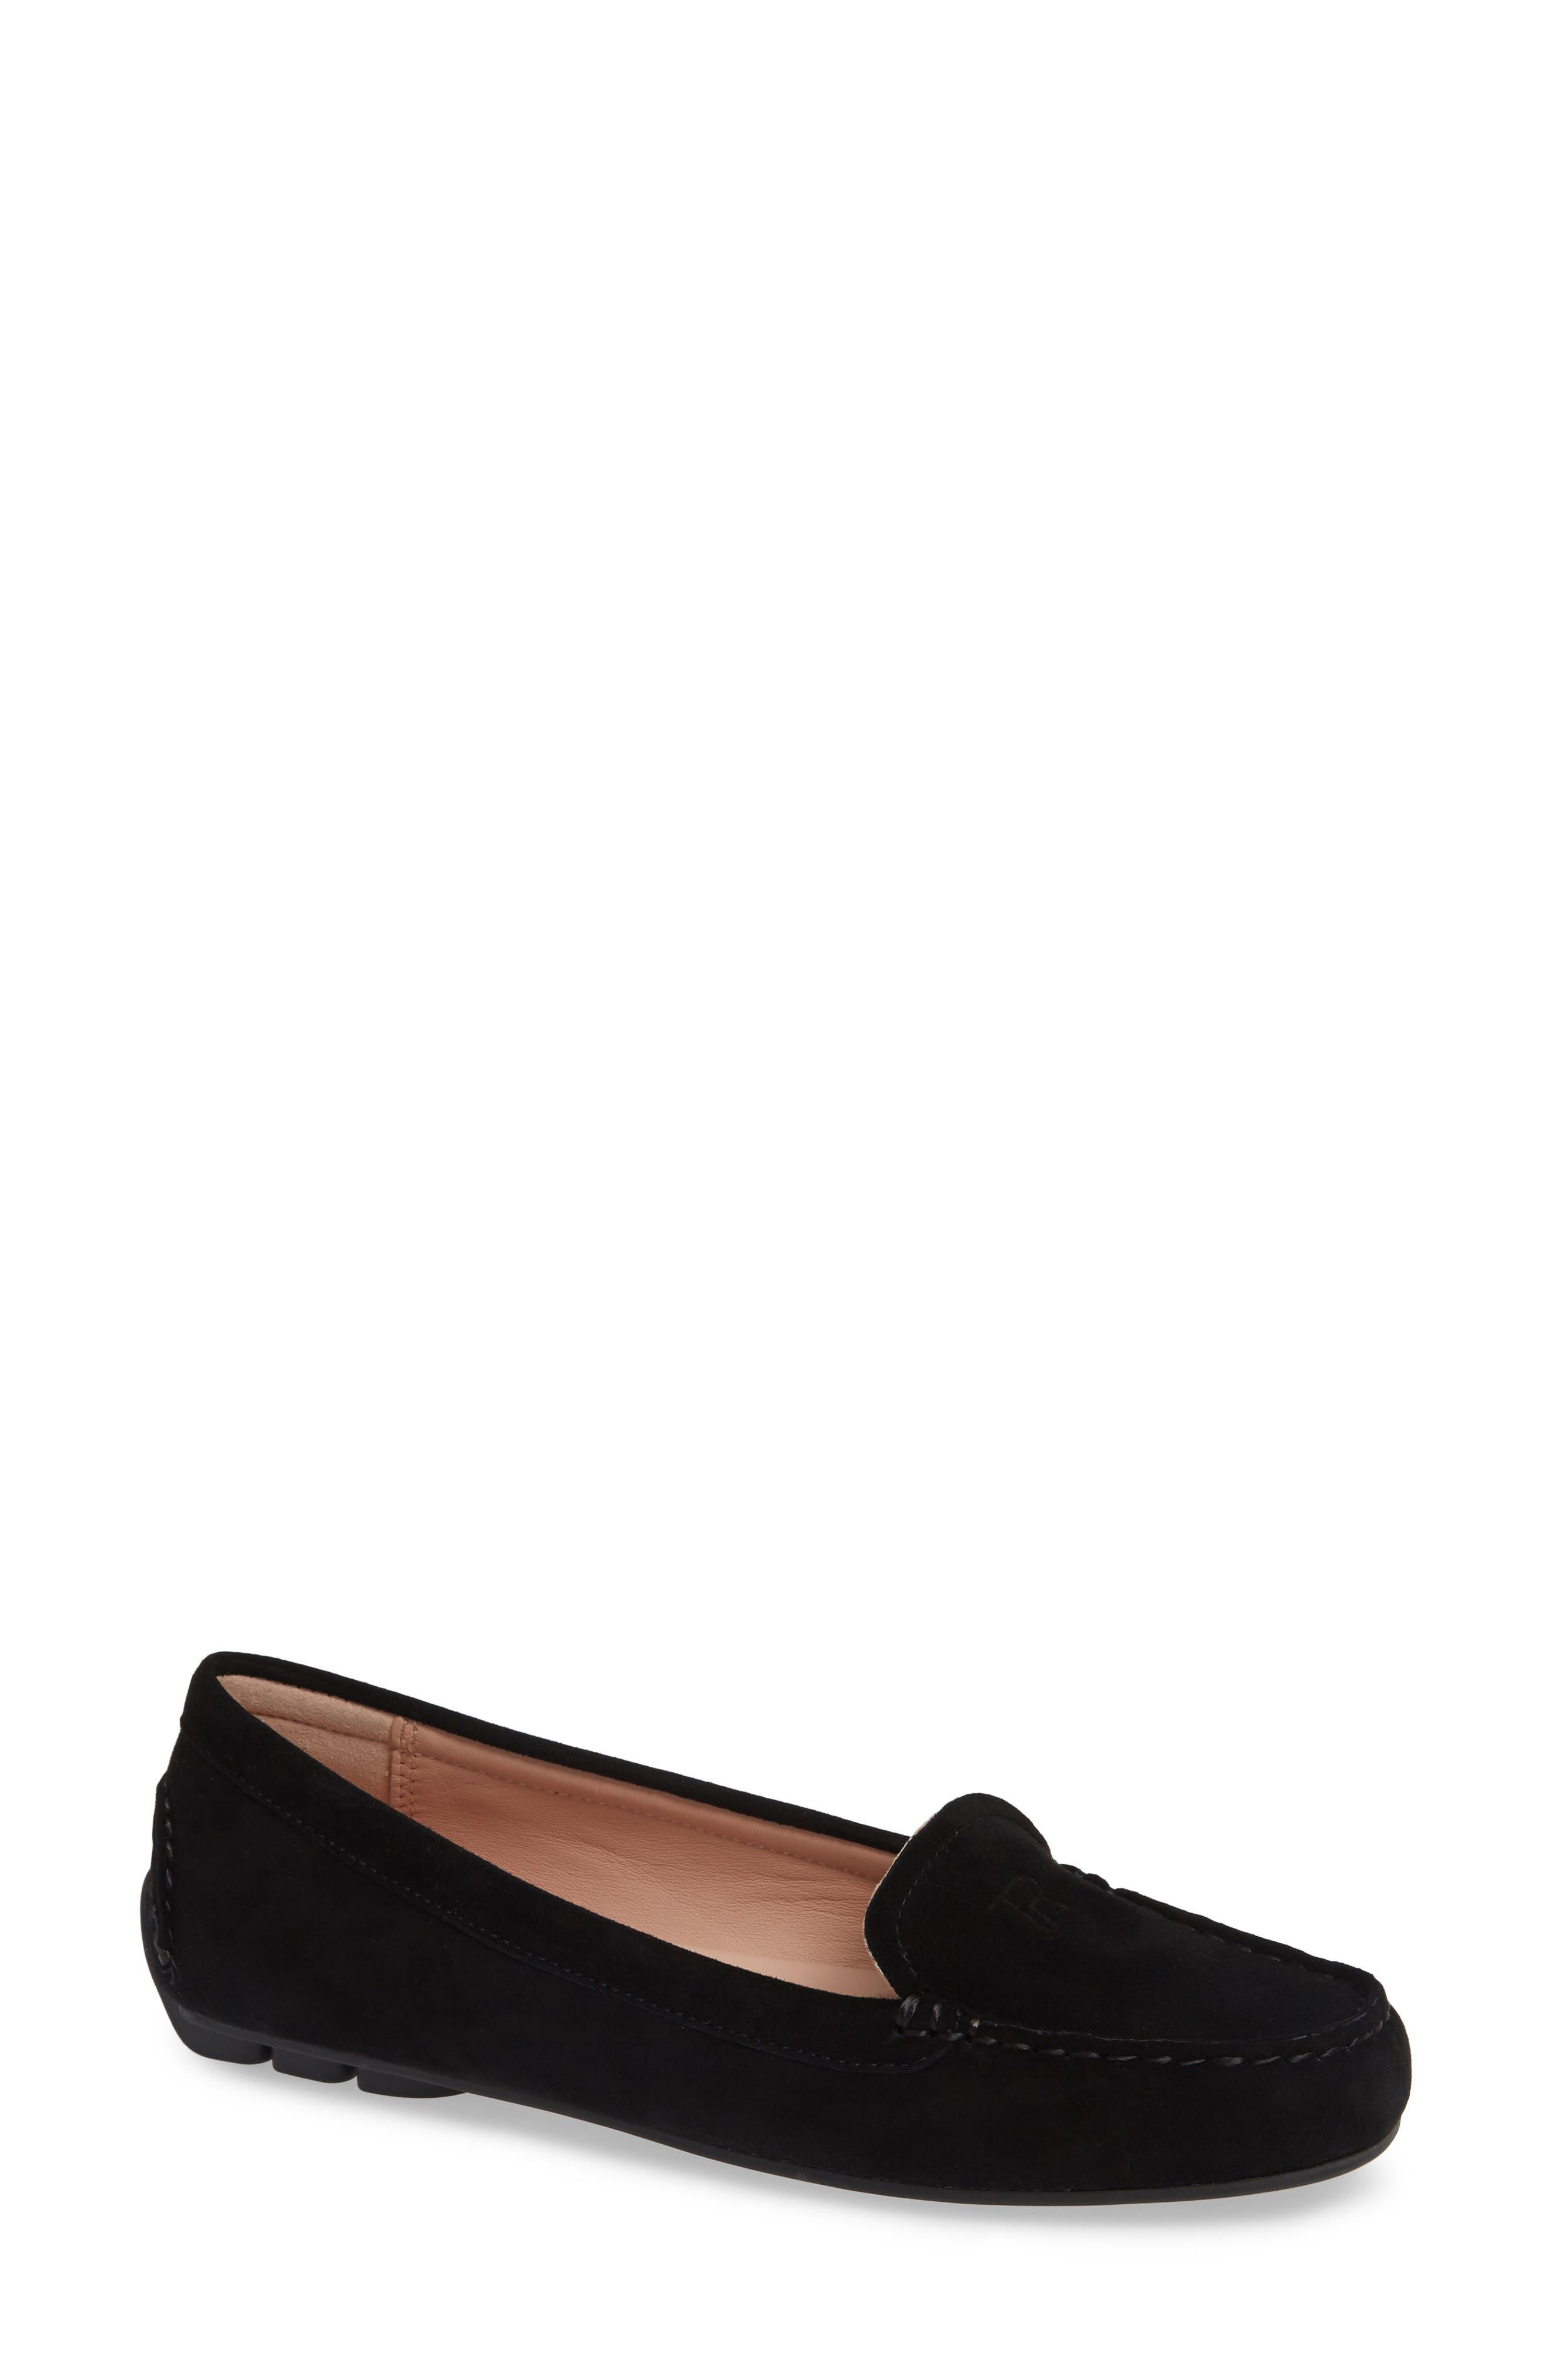 TARYN ROSE Karen Water Resistant Driving Loafer, Main, color, BLACK SUEDE